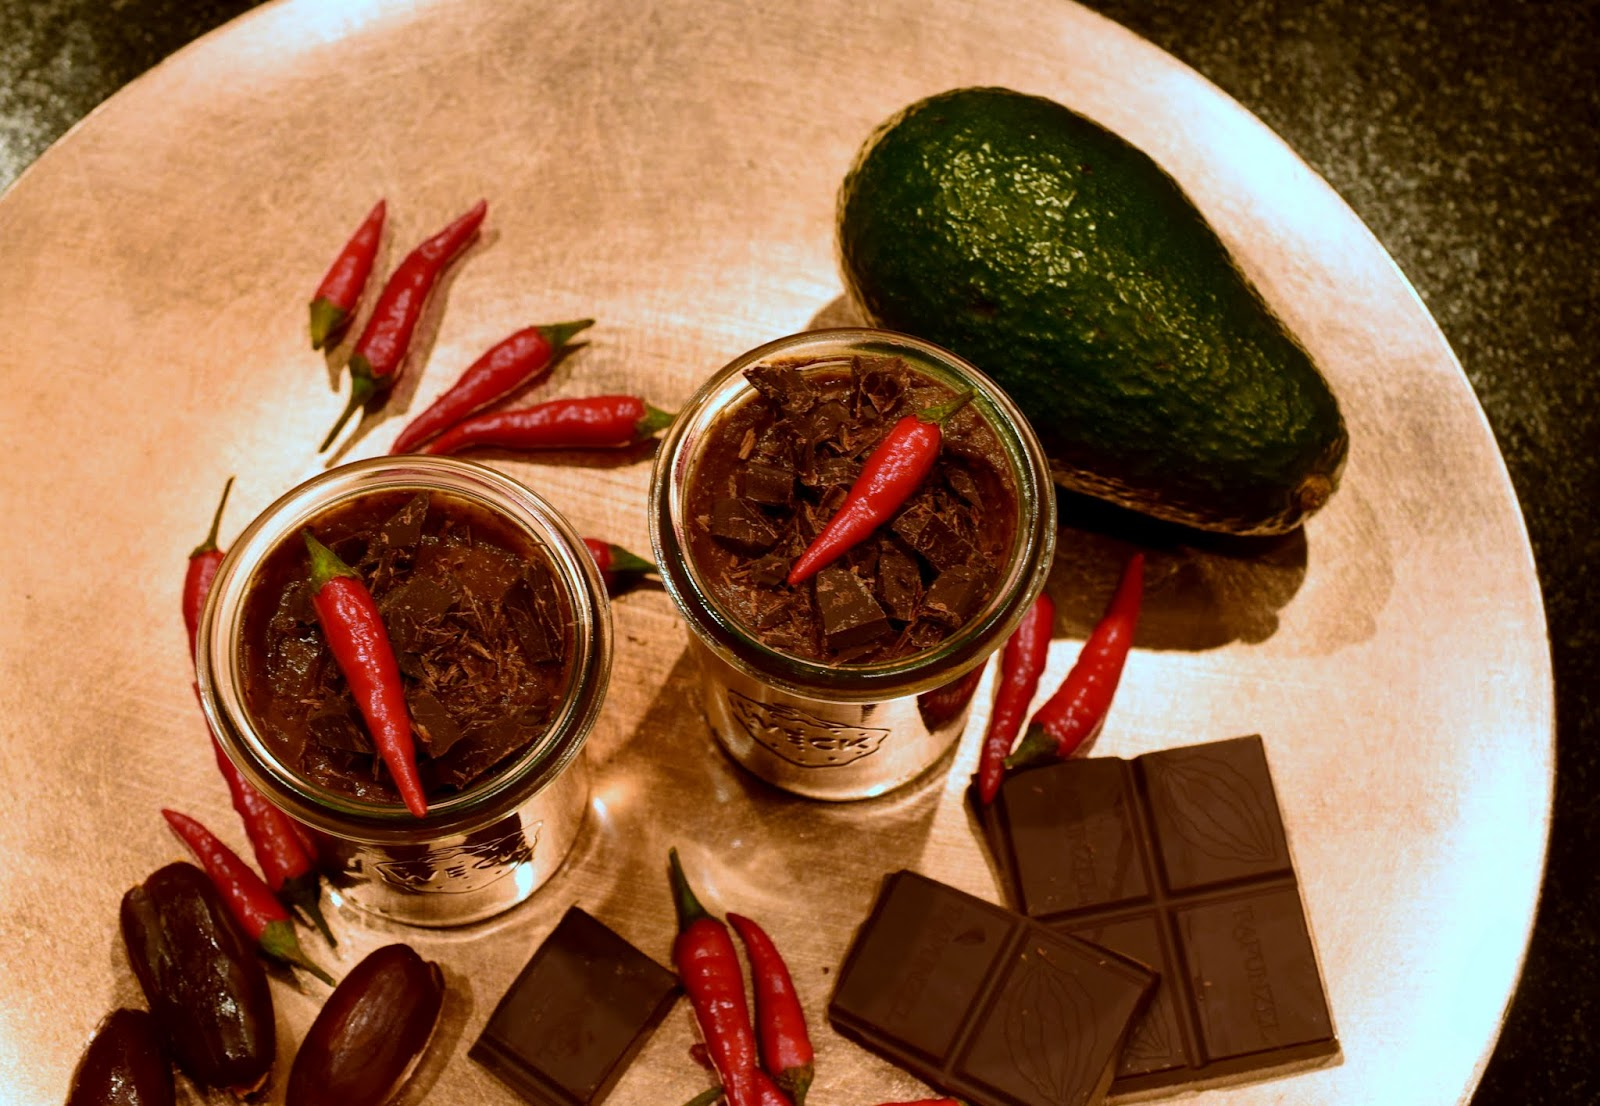 Schnelles einfaches Rezept Healthy Chili-Mousse-au-Chocolat mit Avocado Datteln Chili